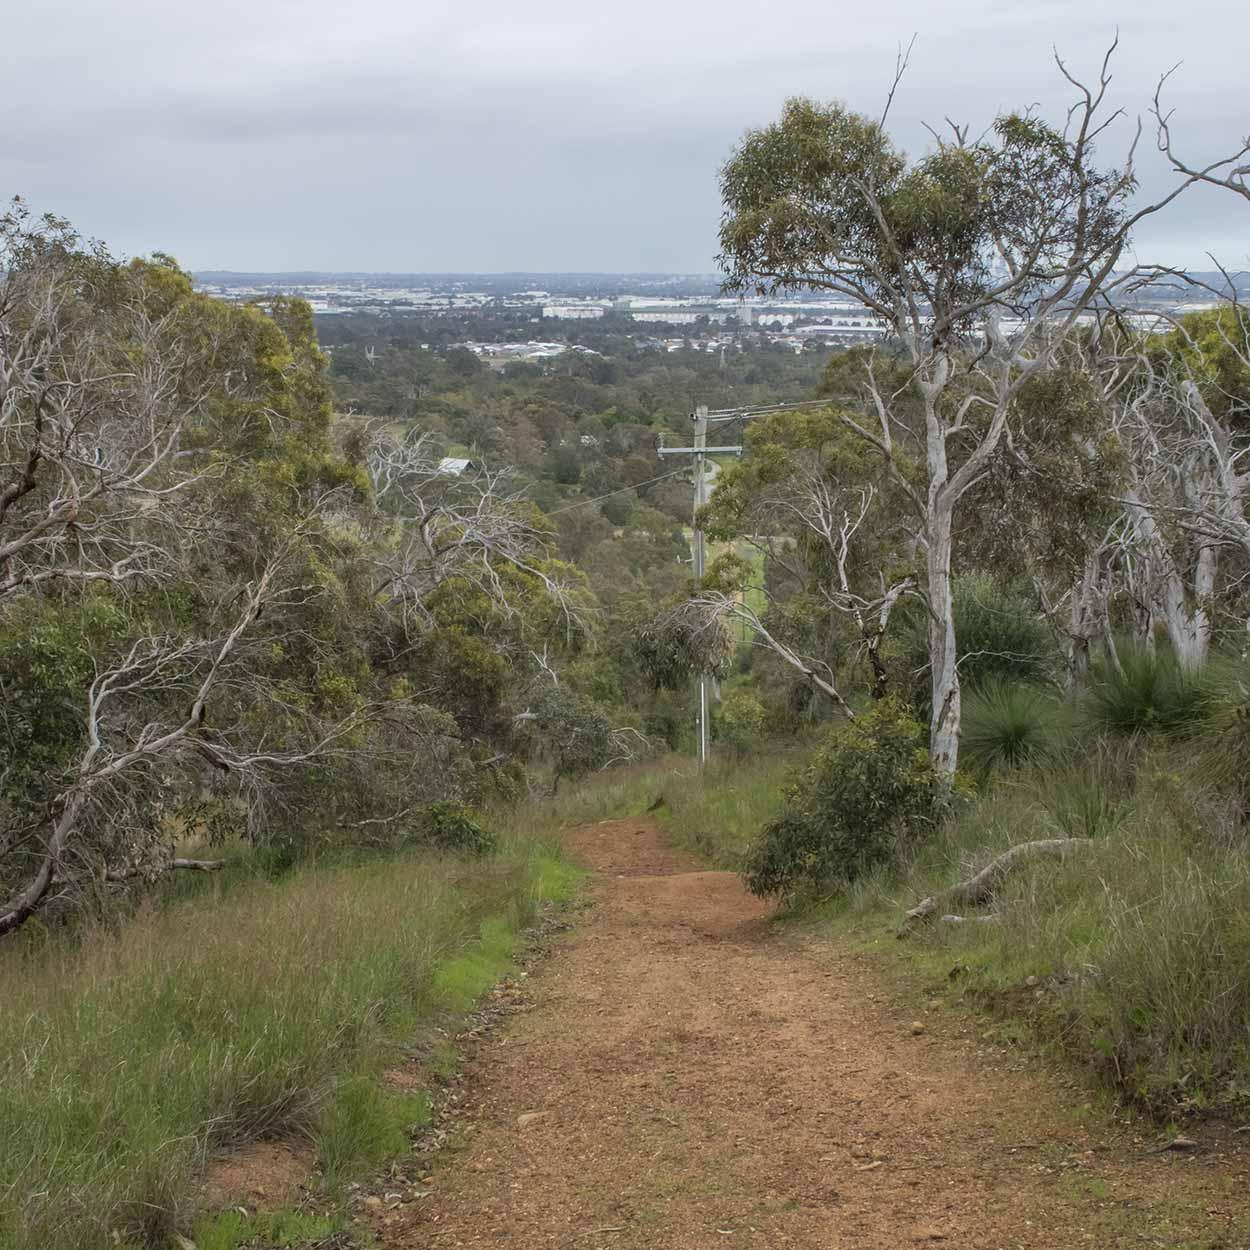 Downhill on the West Terrace Walk, Mundy Regional Park, Perth, Western Australia